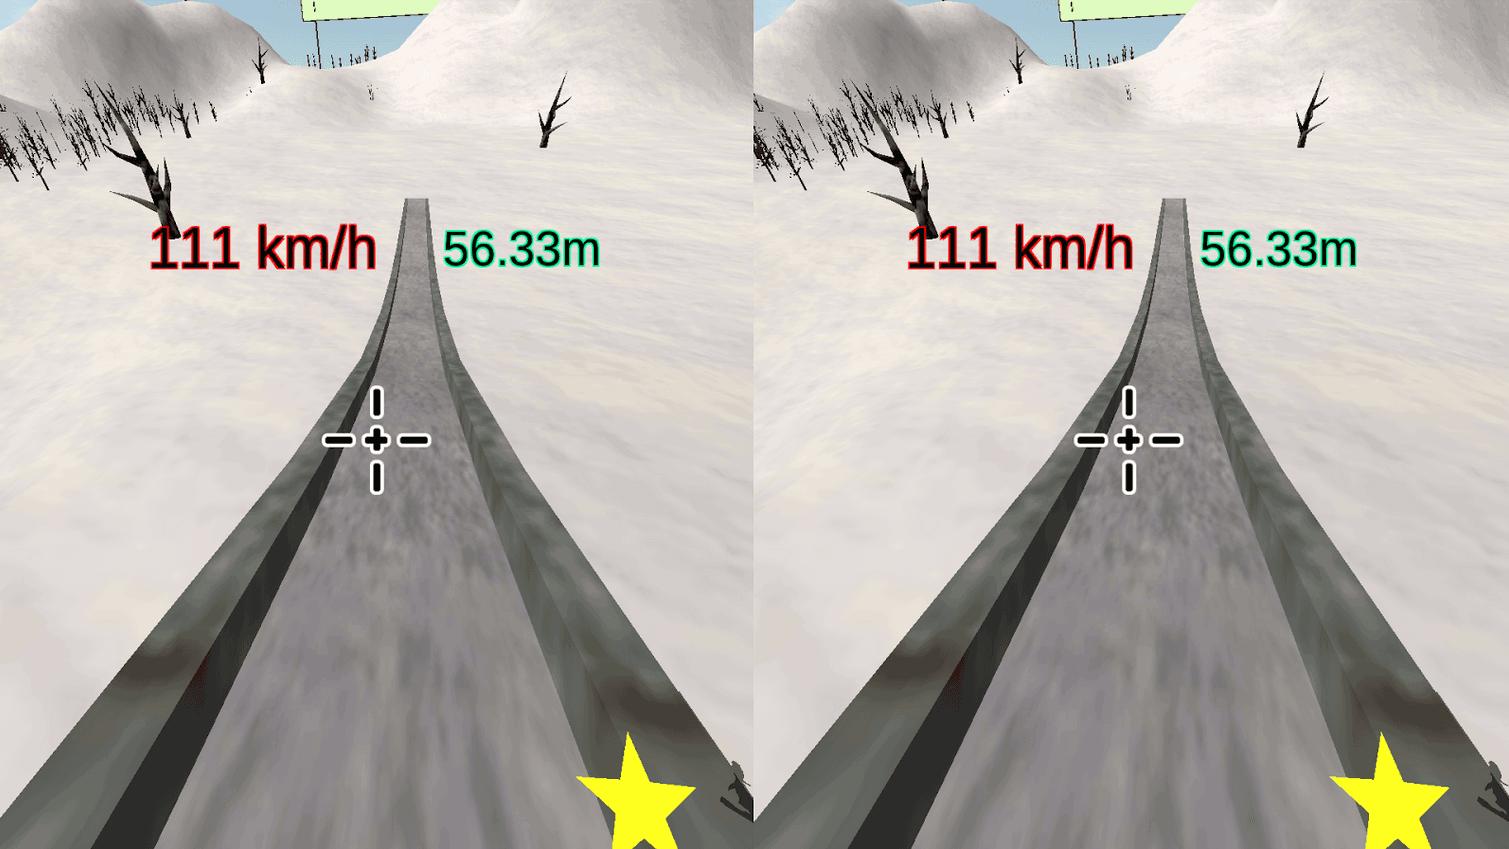 VR SkiJump,cardboard